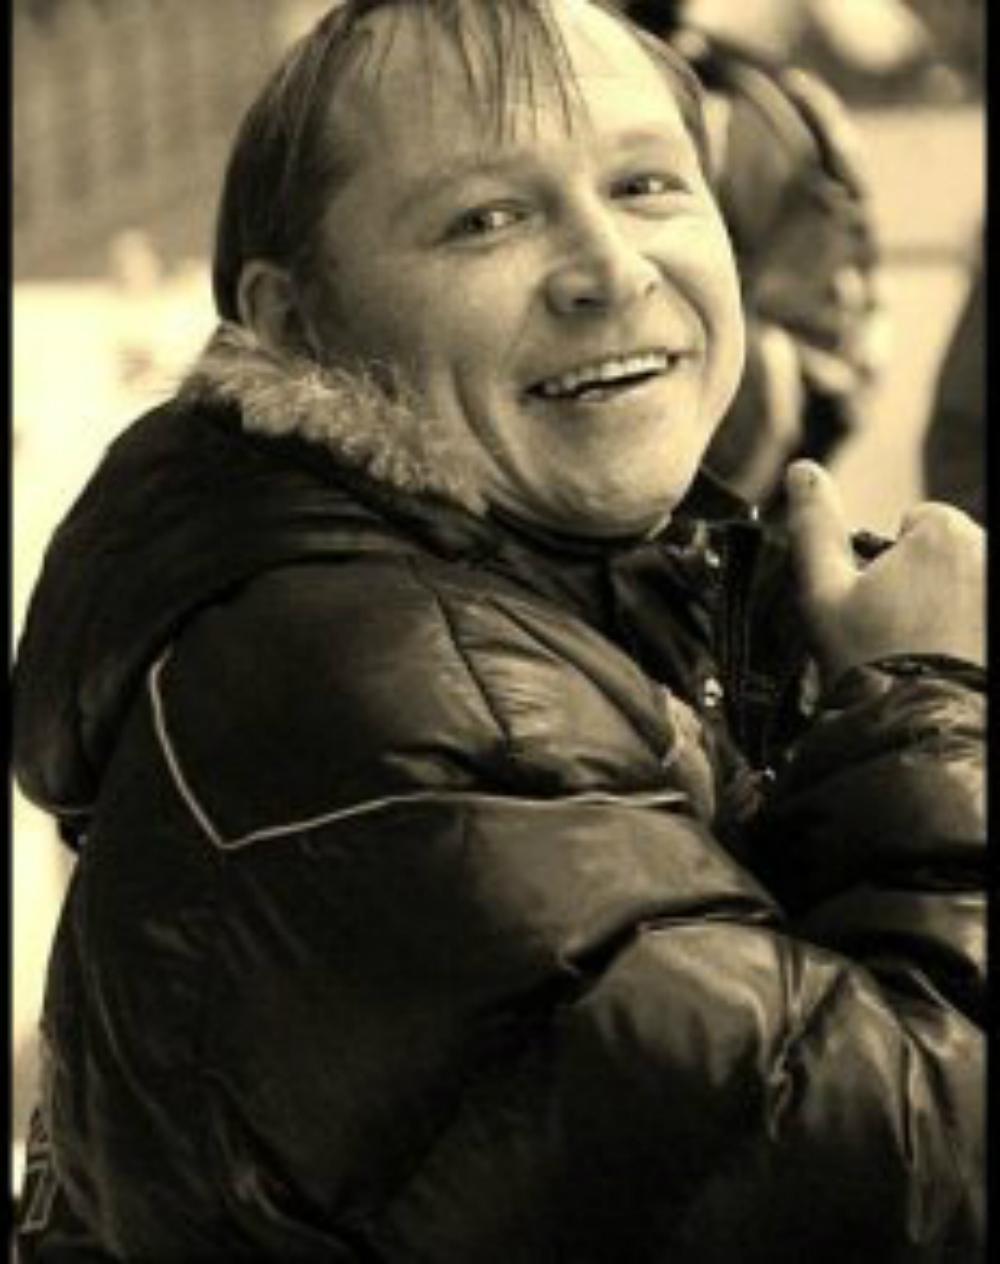 ВНовосибирске найден мертвым прежний хоккеист «Спартака» и«Динамо» Девяткин